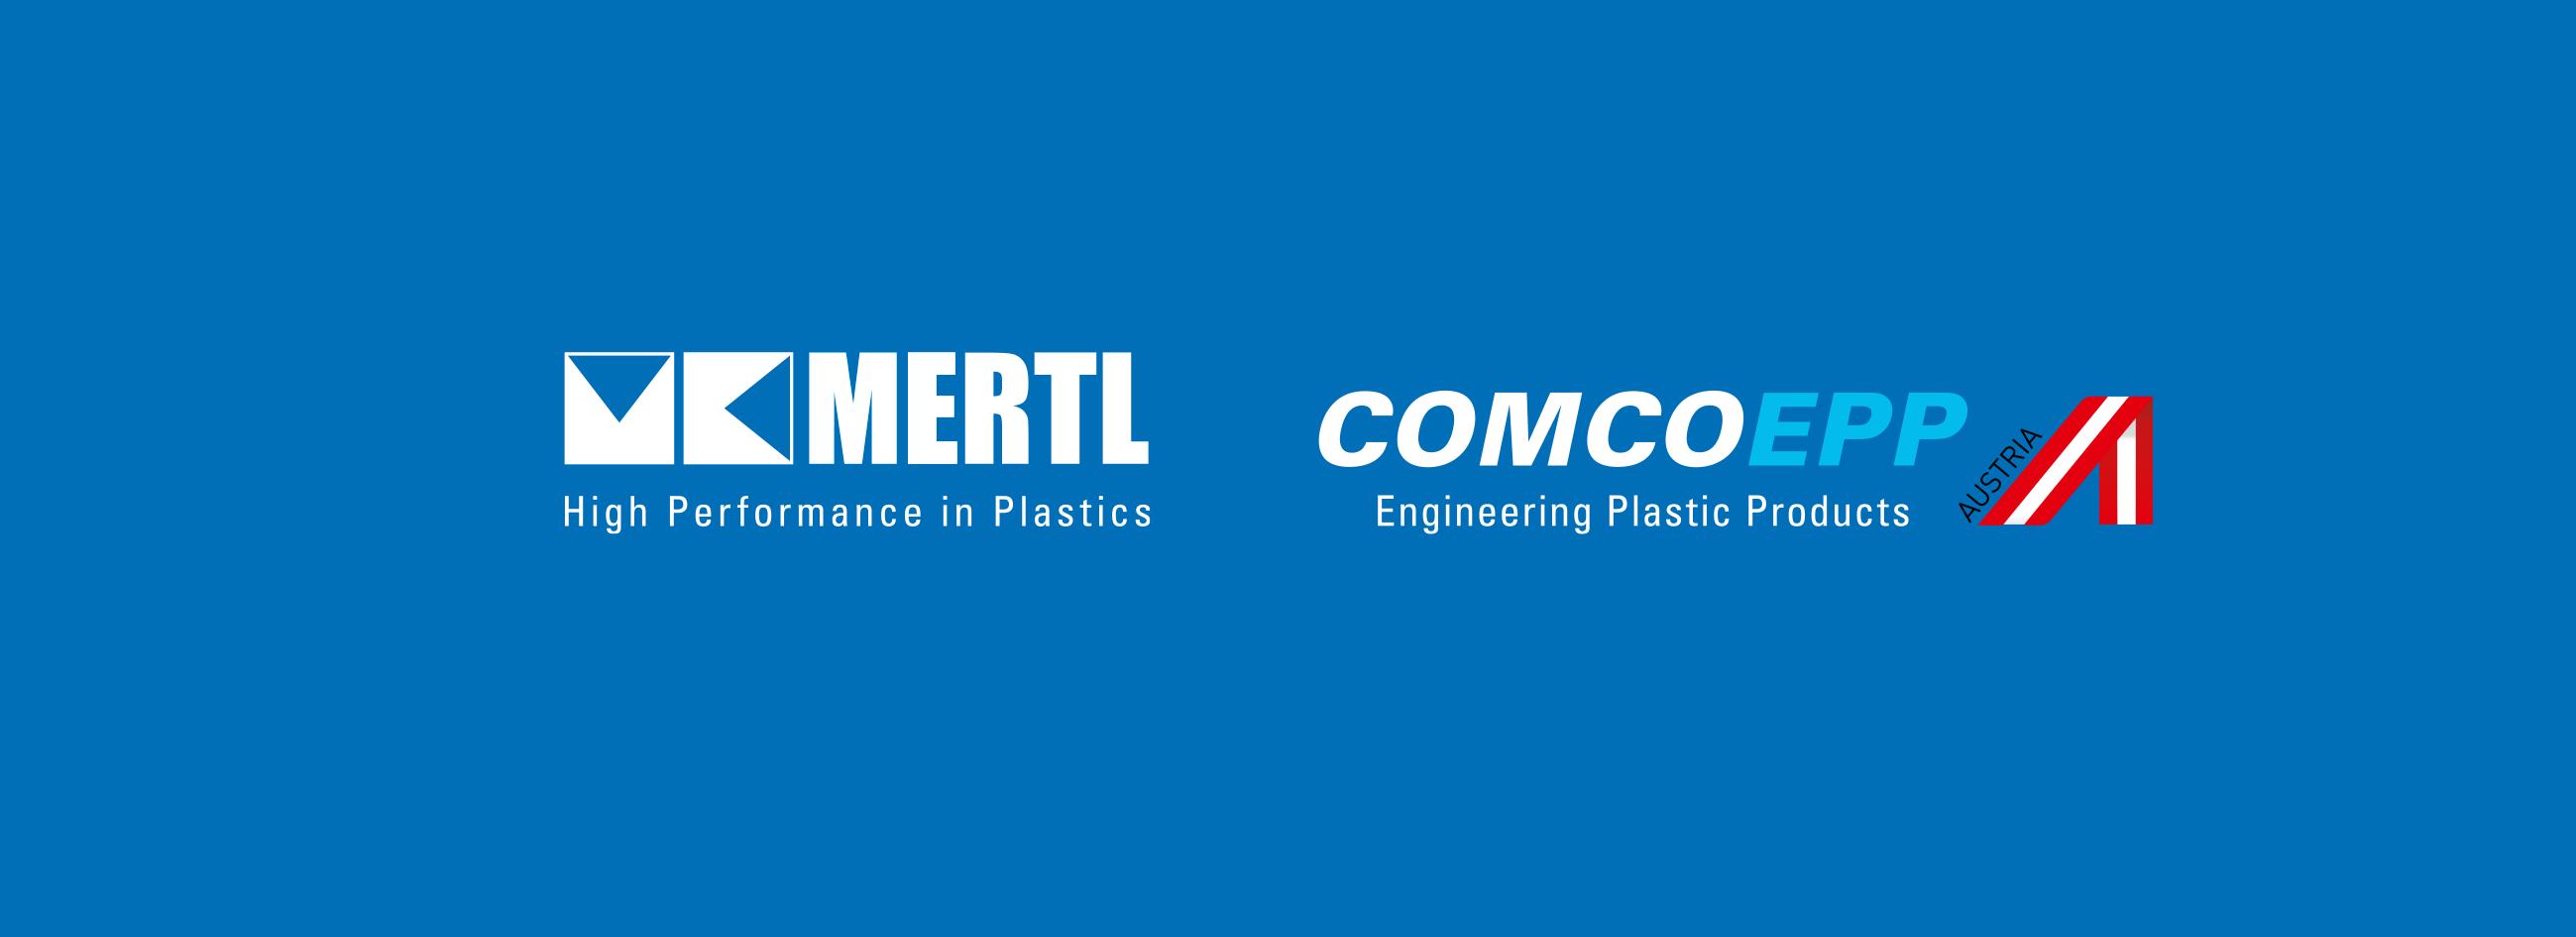 Mertl Comco Logo